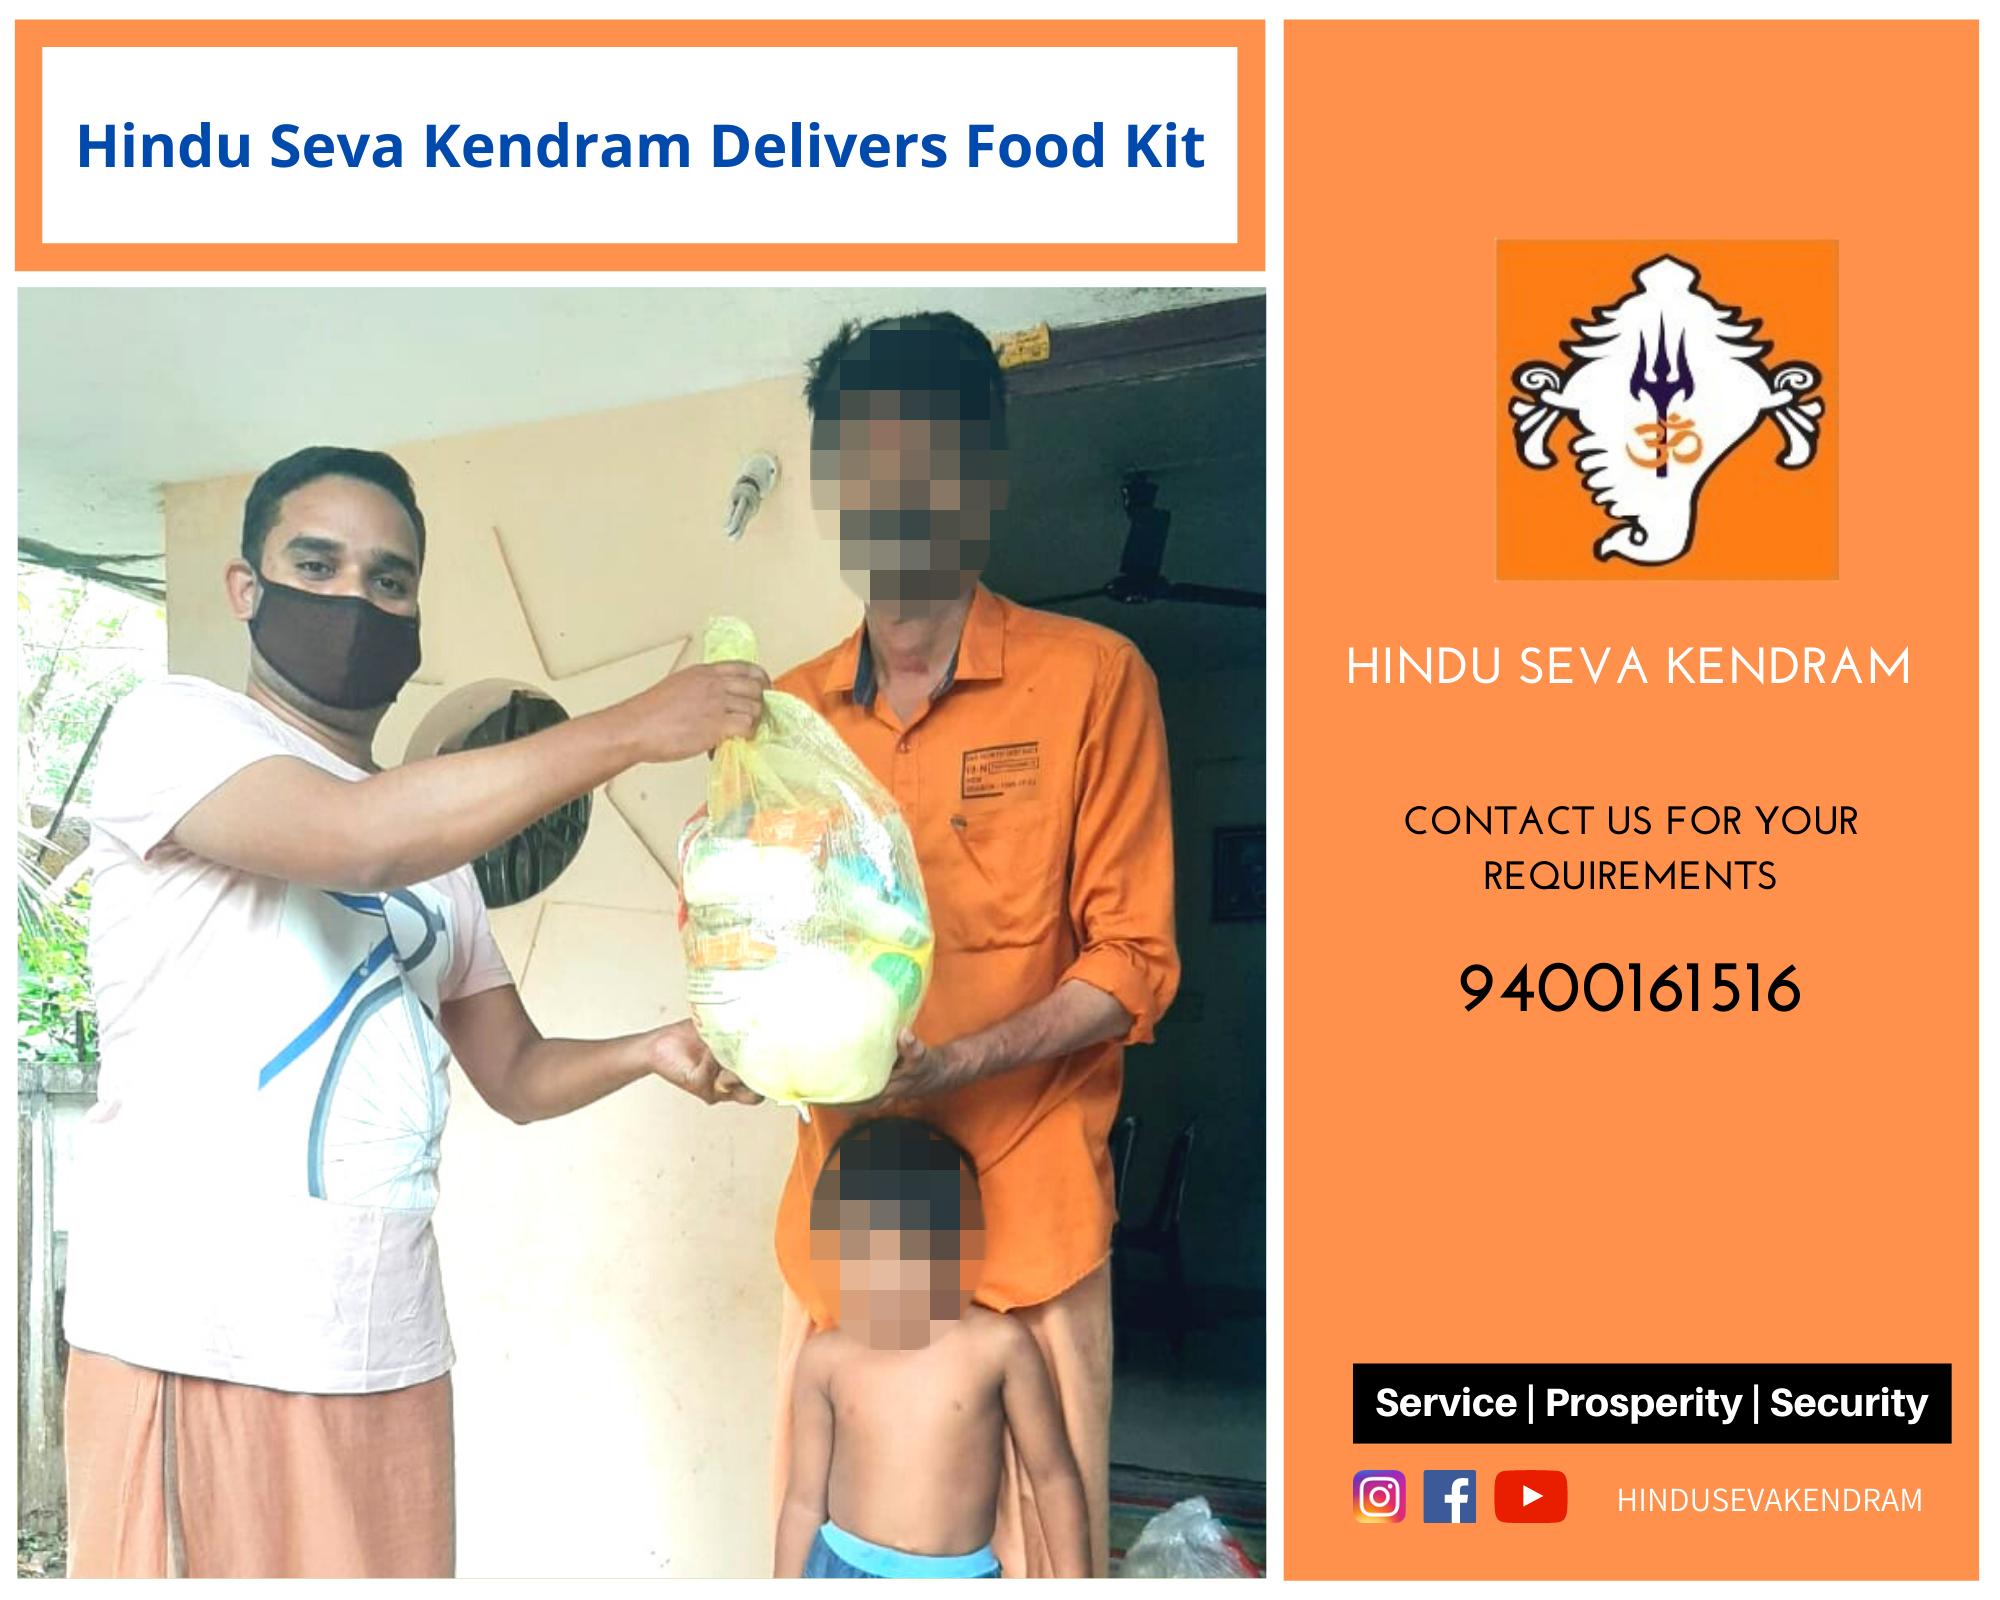 Hindu Seva Kendram Delivers Food Kit